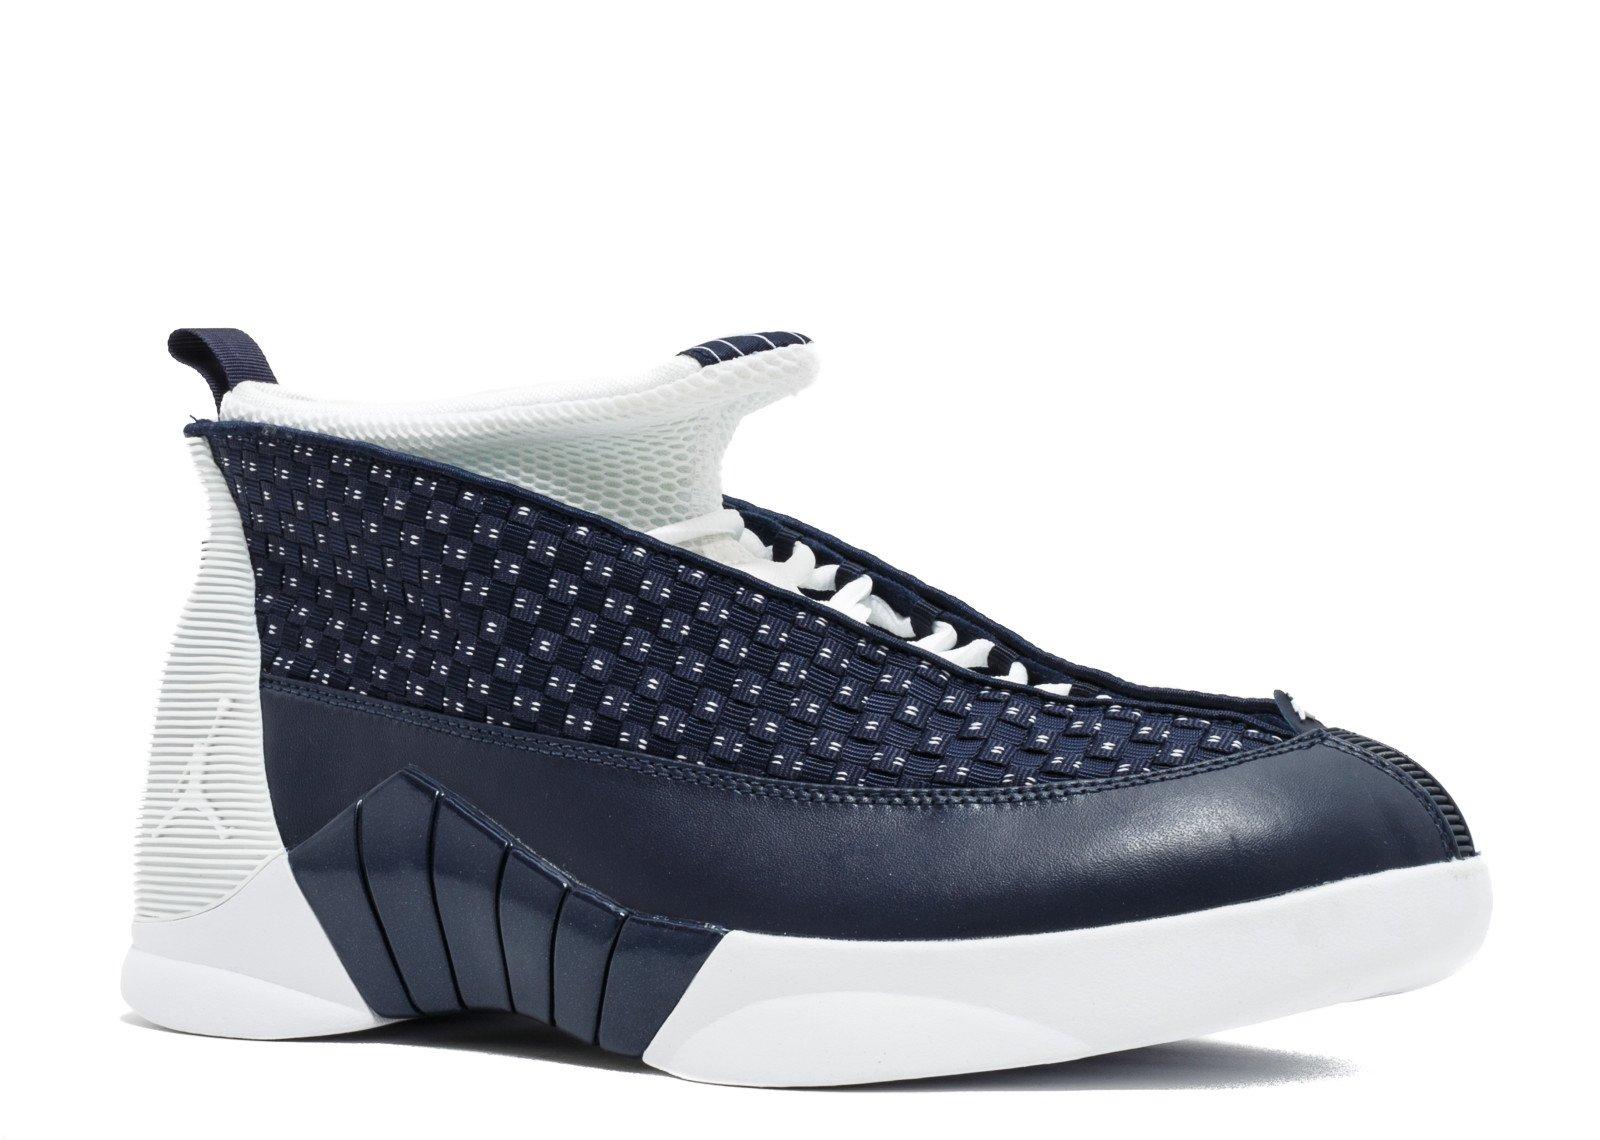 0f82094cf62452 Amazon.com  Nike Air Jordan 15 Retro Mens Obsidian White 881429-400 ...